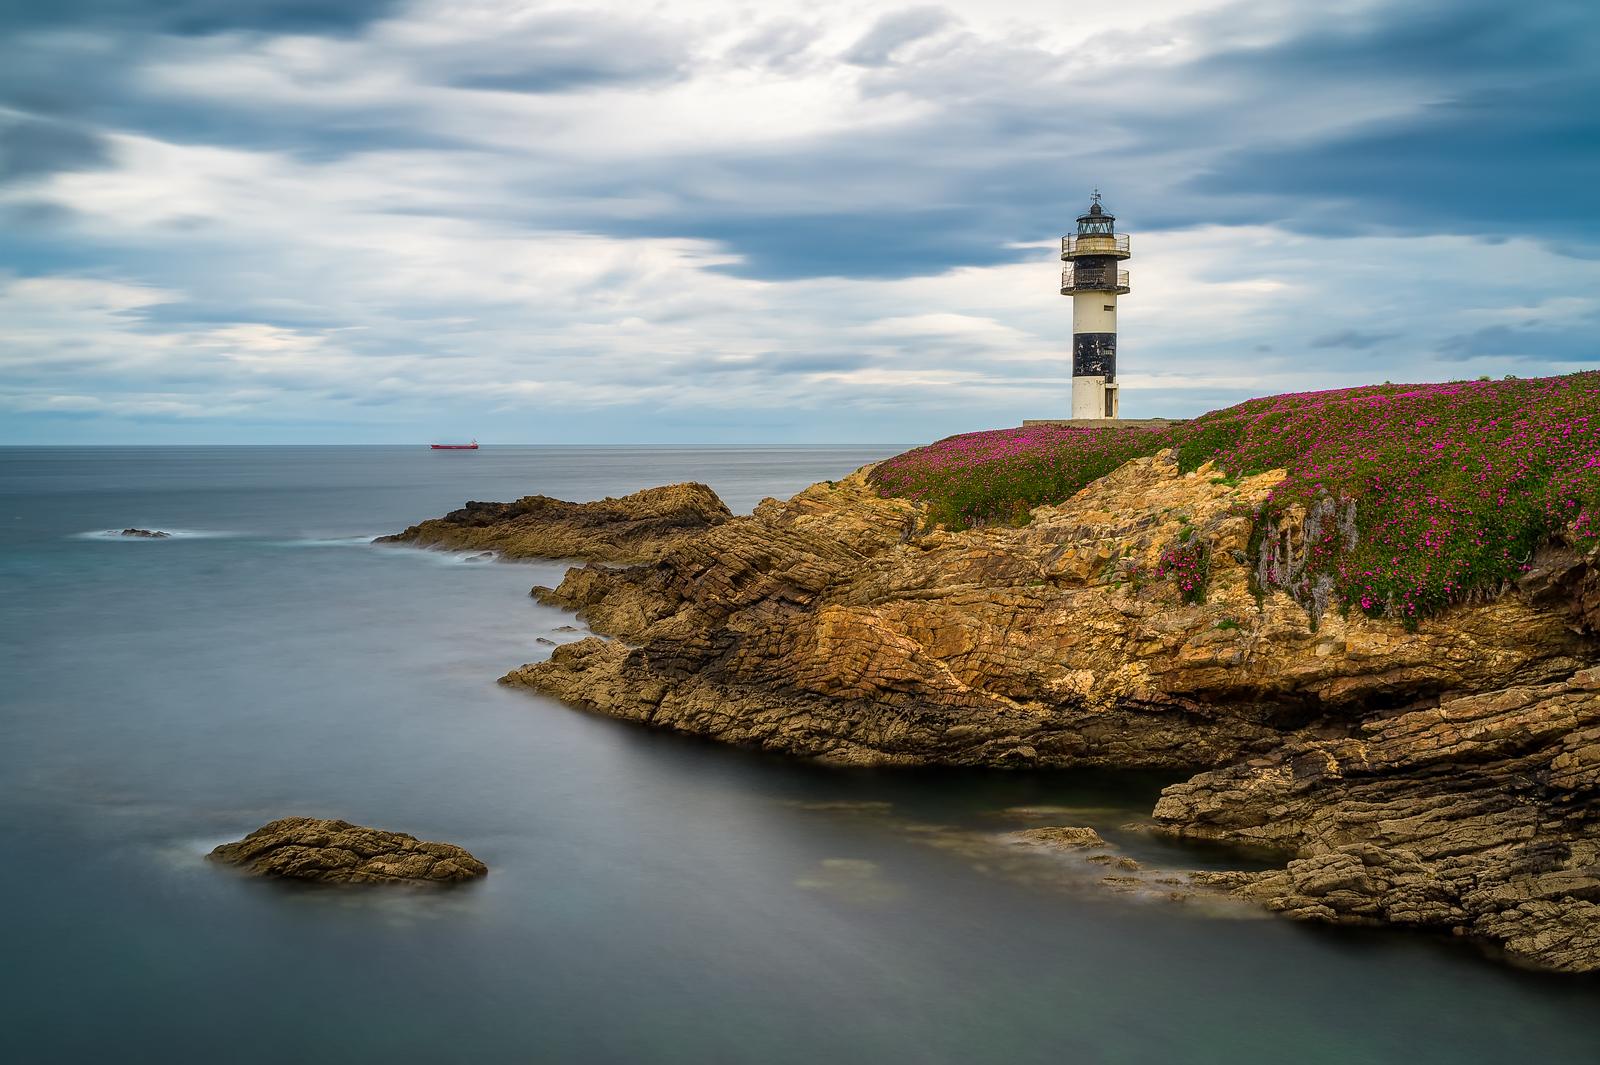 The peaceful lighthouse